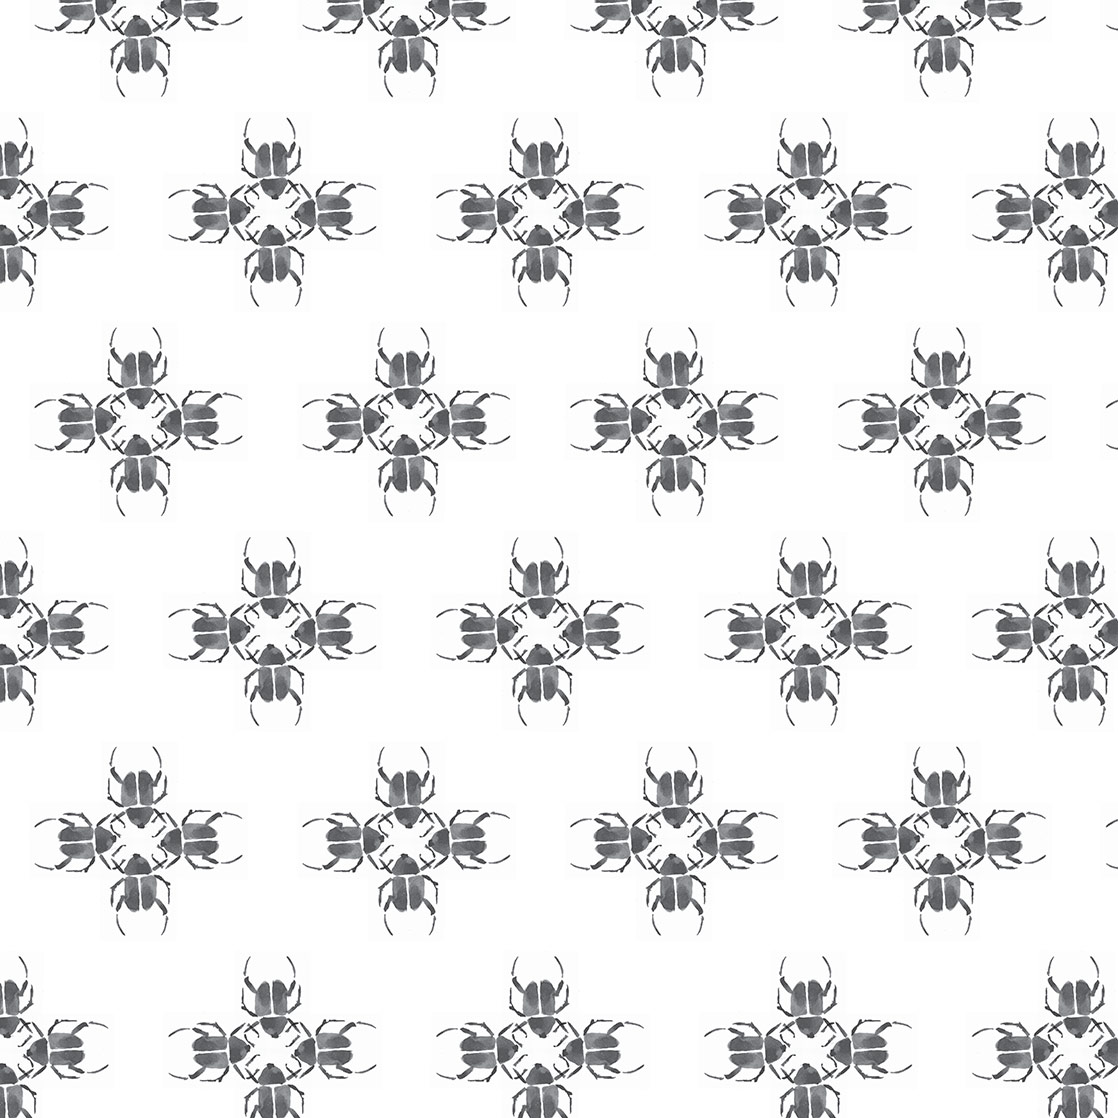 Bugs – Pattern 2